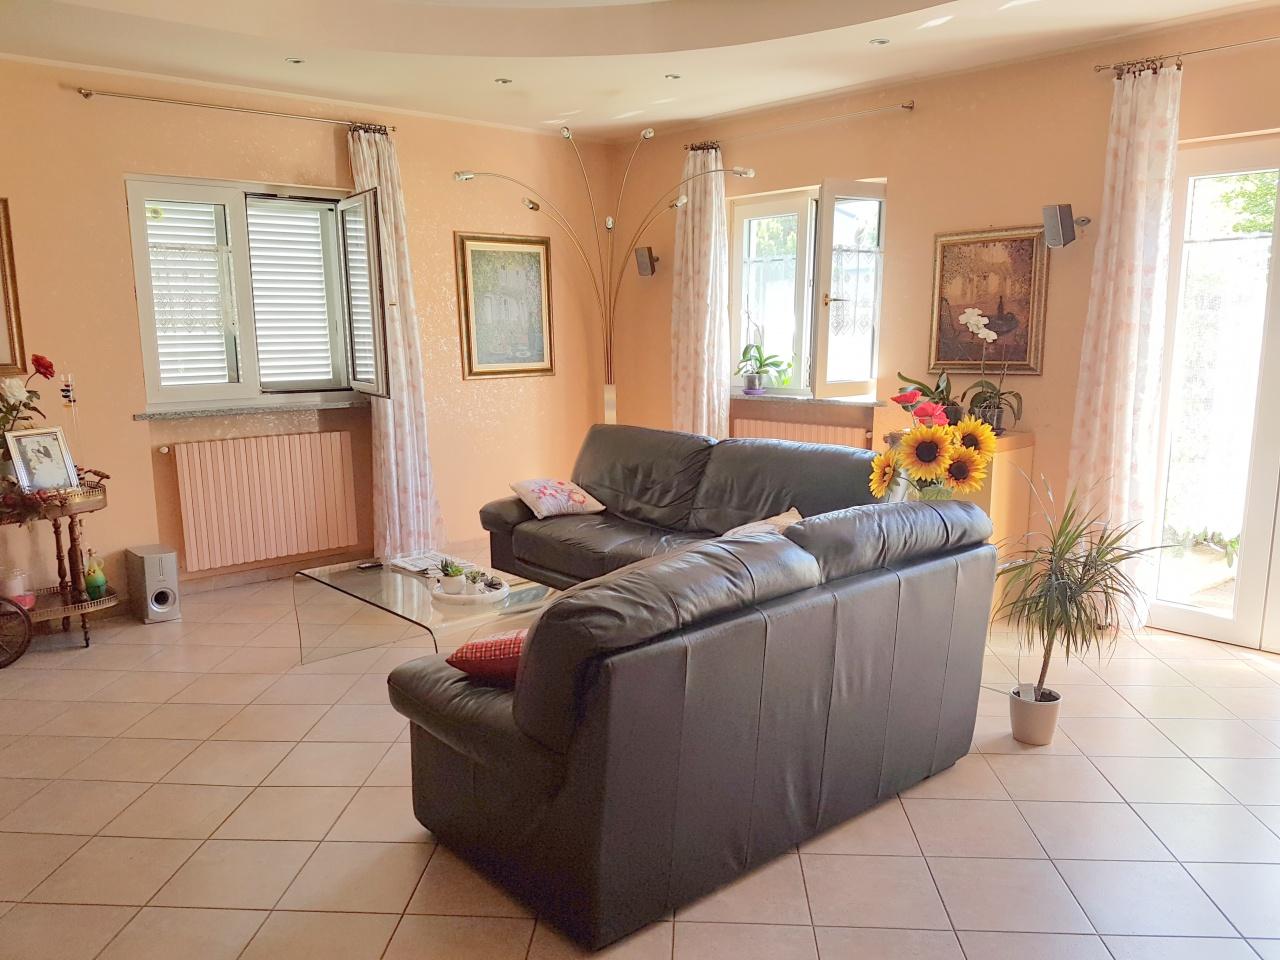 Casa Indipendente in ottime condizioni in vendita Rif. 10774622